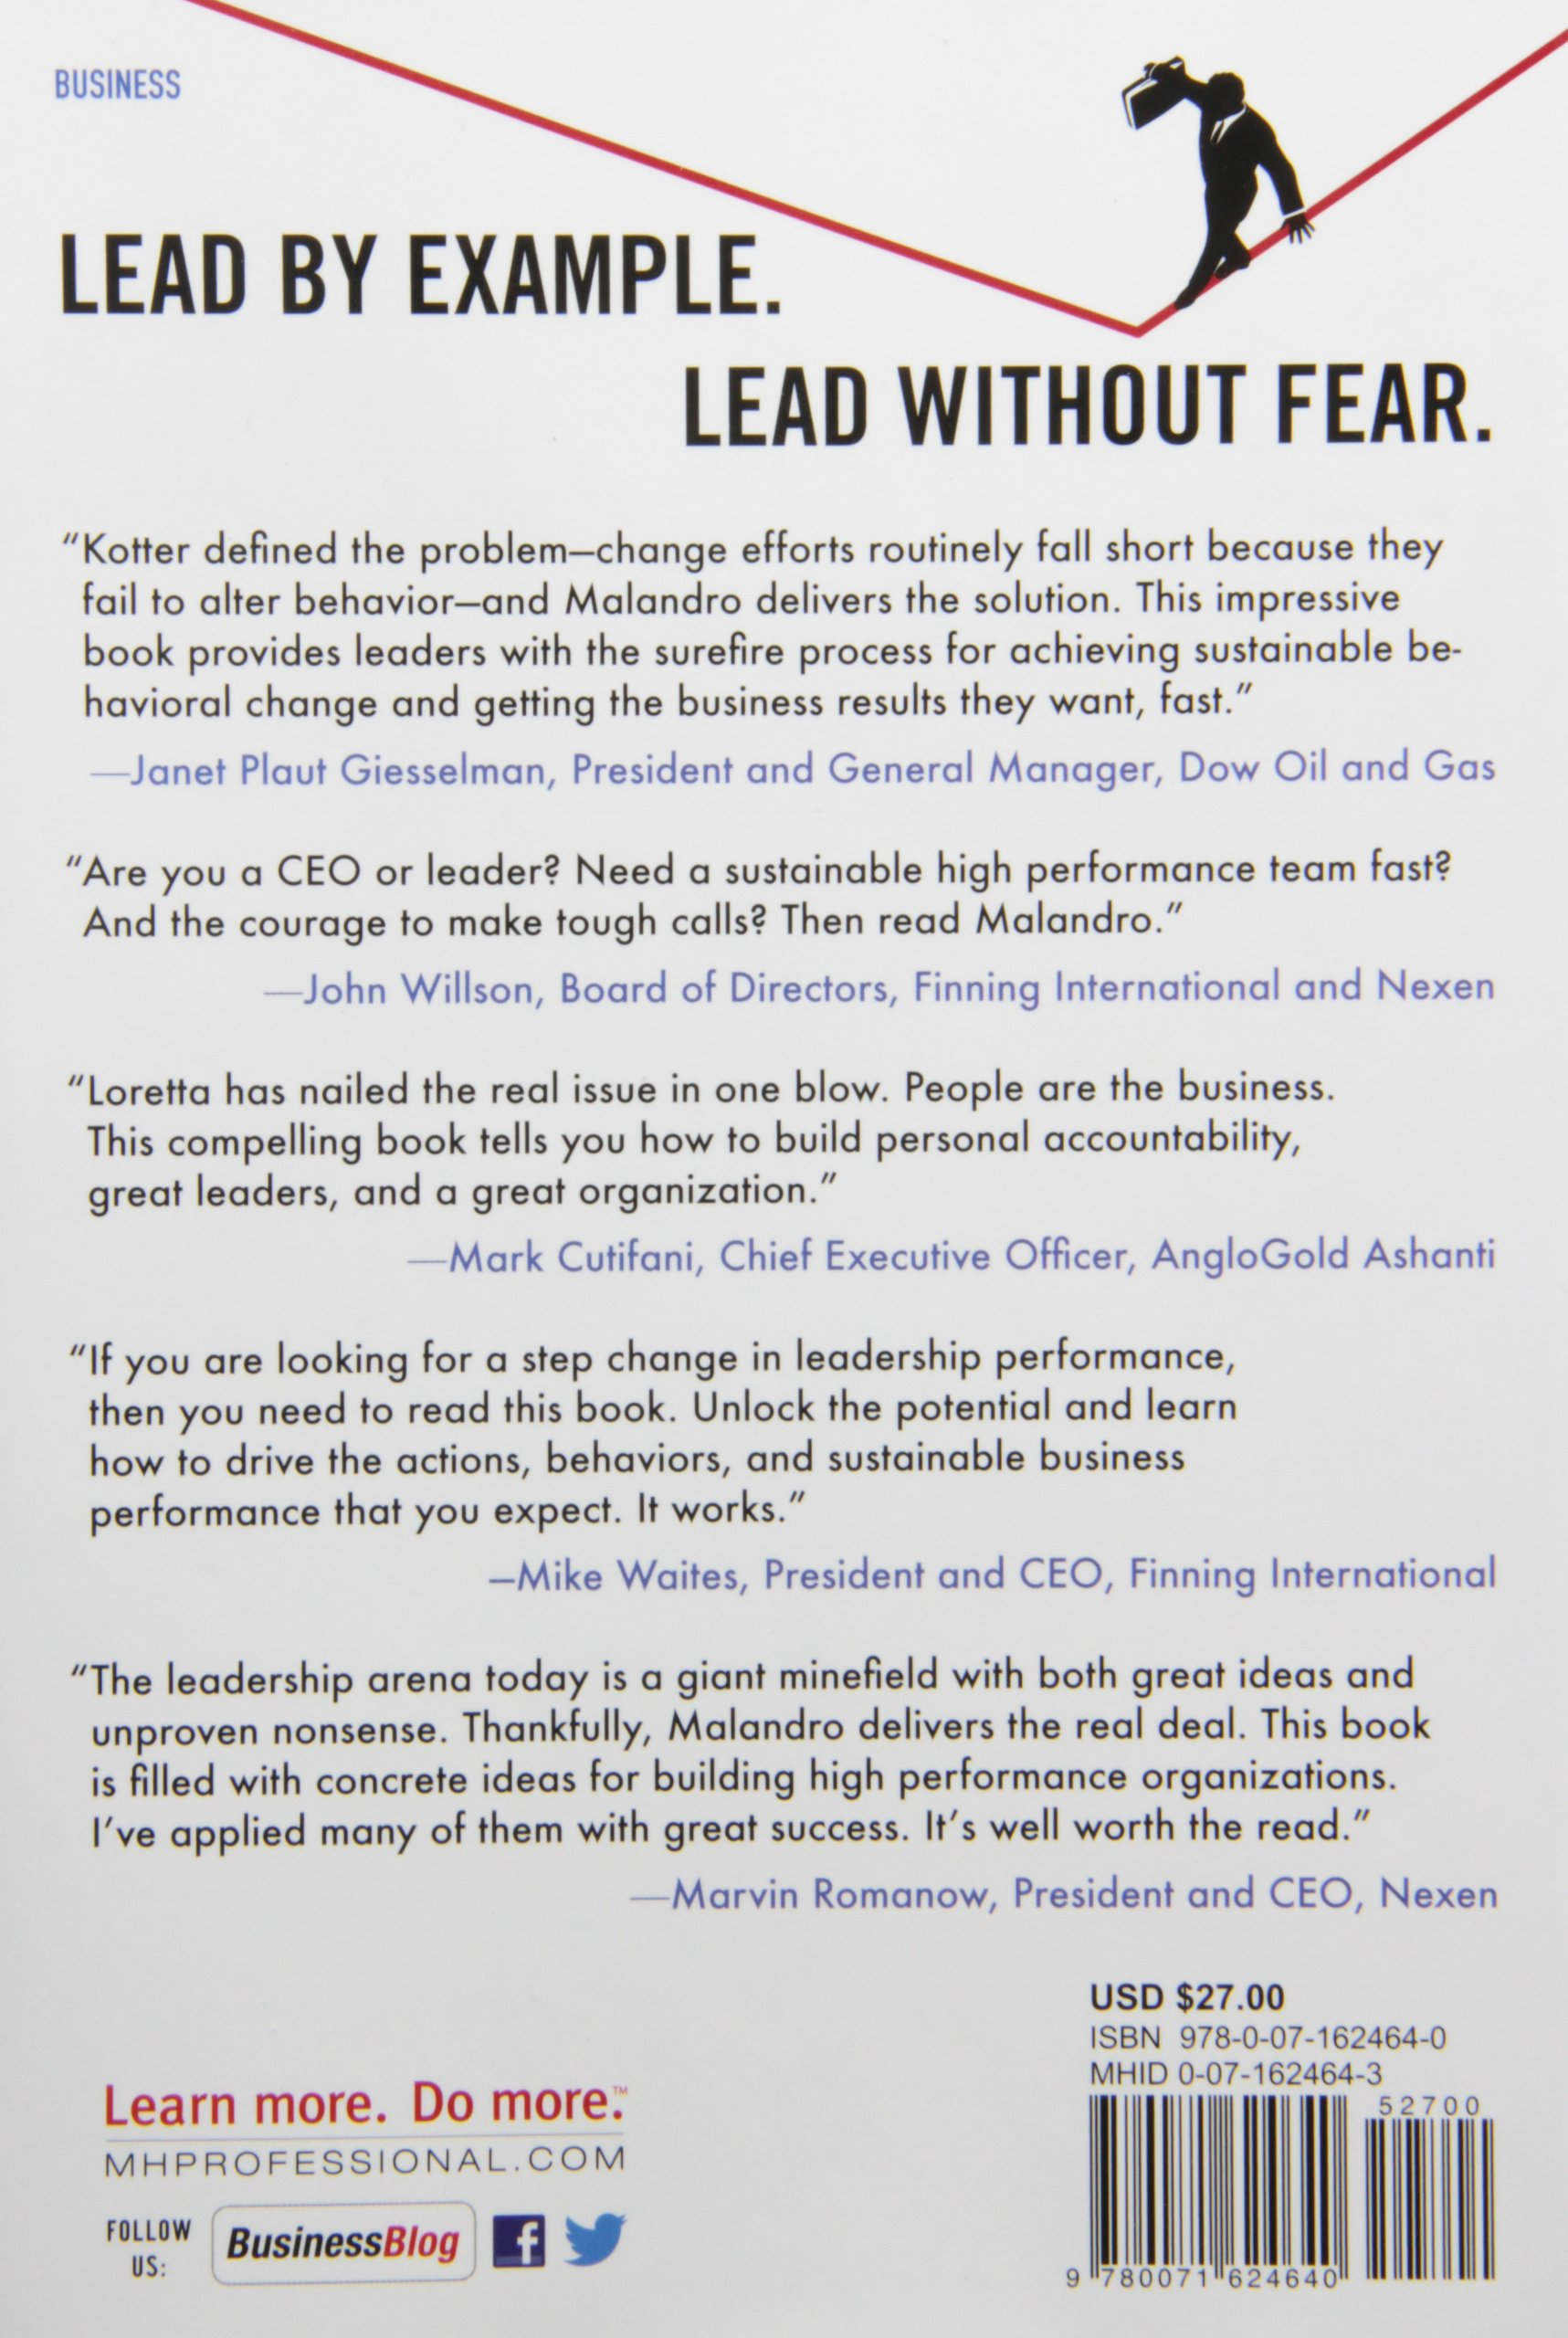 fearless leadership how to overcome behavioral blindspots and fearless leadership how to overcome behavioral blindspots and transform your organization business books loretta malandro 9780071624640 com